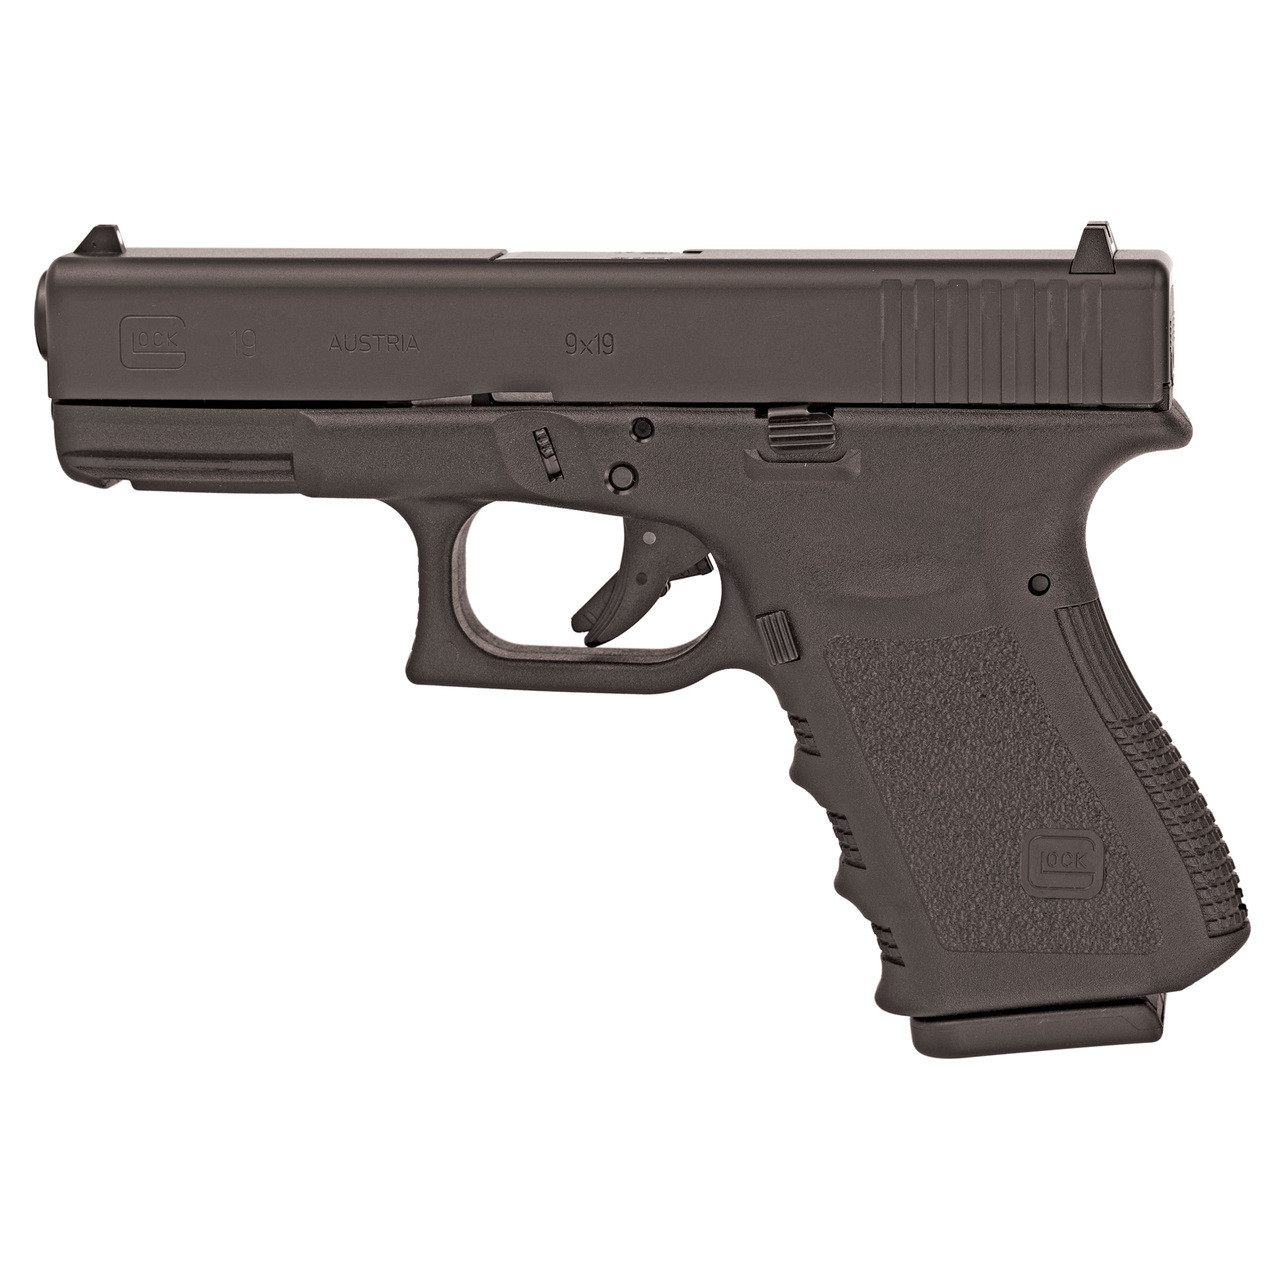 Glock 19 Gen3 W/Streamlight TLR-7 CALIFORNIA LEGAL - 9mm